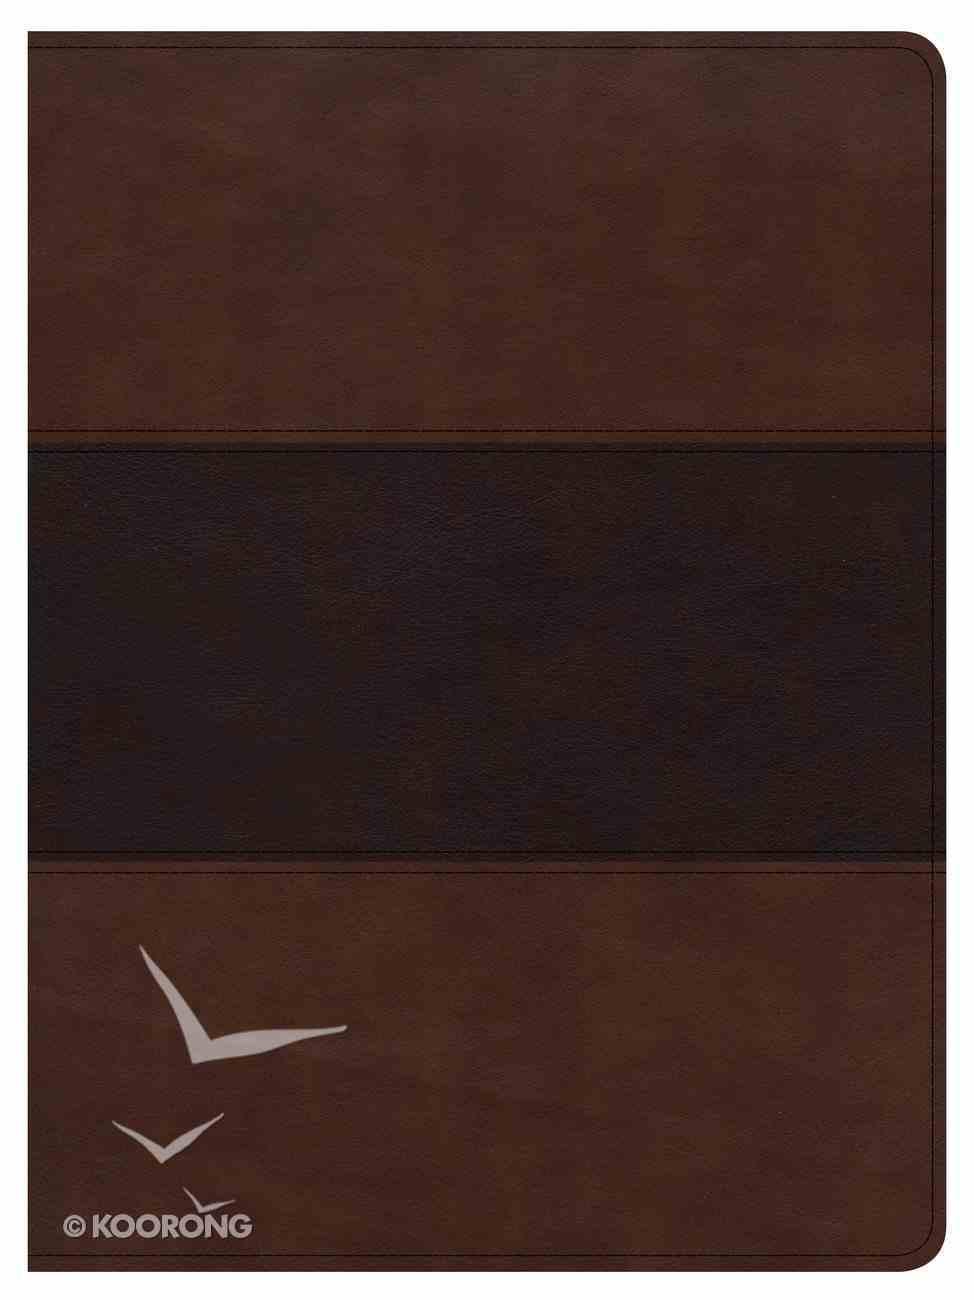 CSB Apologetics Study Bible Mahogany Imitation Leather